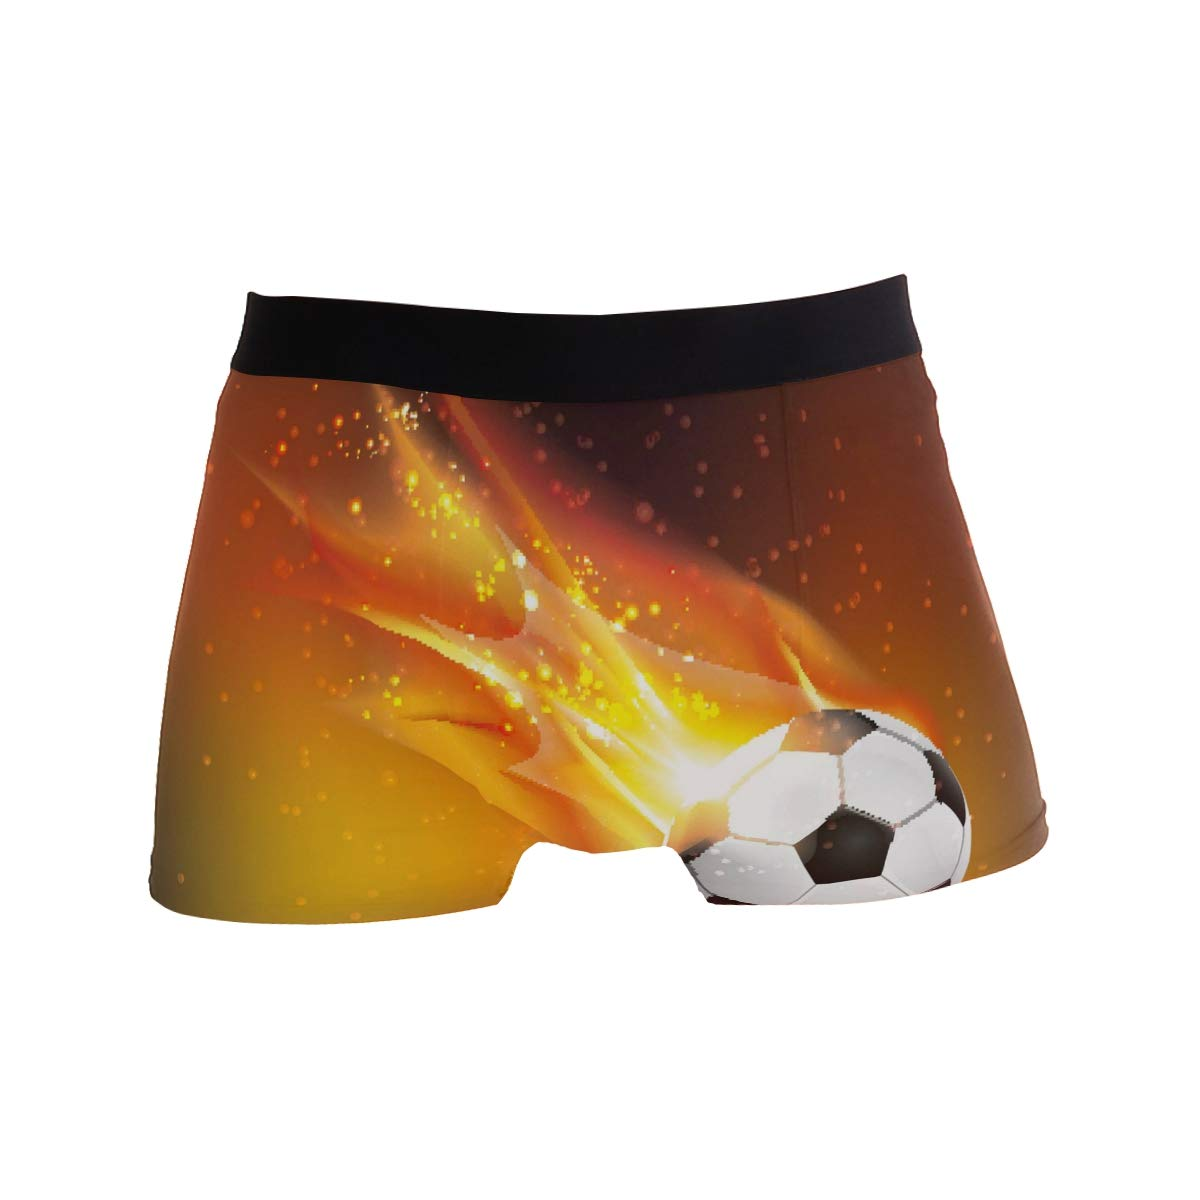 Men Boxer Briefs Polyester Underwear Men 2 Pack Boxer Briefs for Valentines Day with Foot Ball Pattern